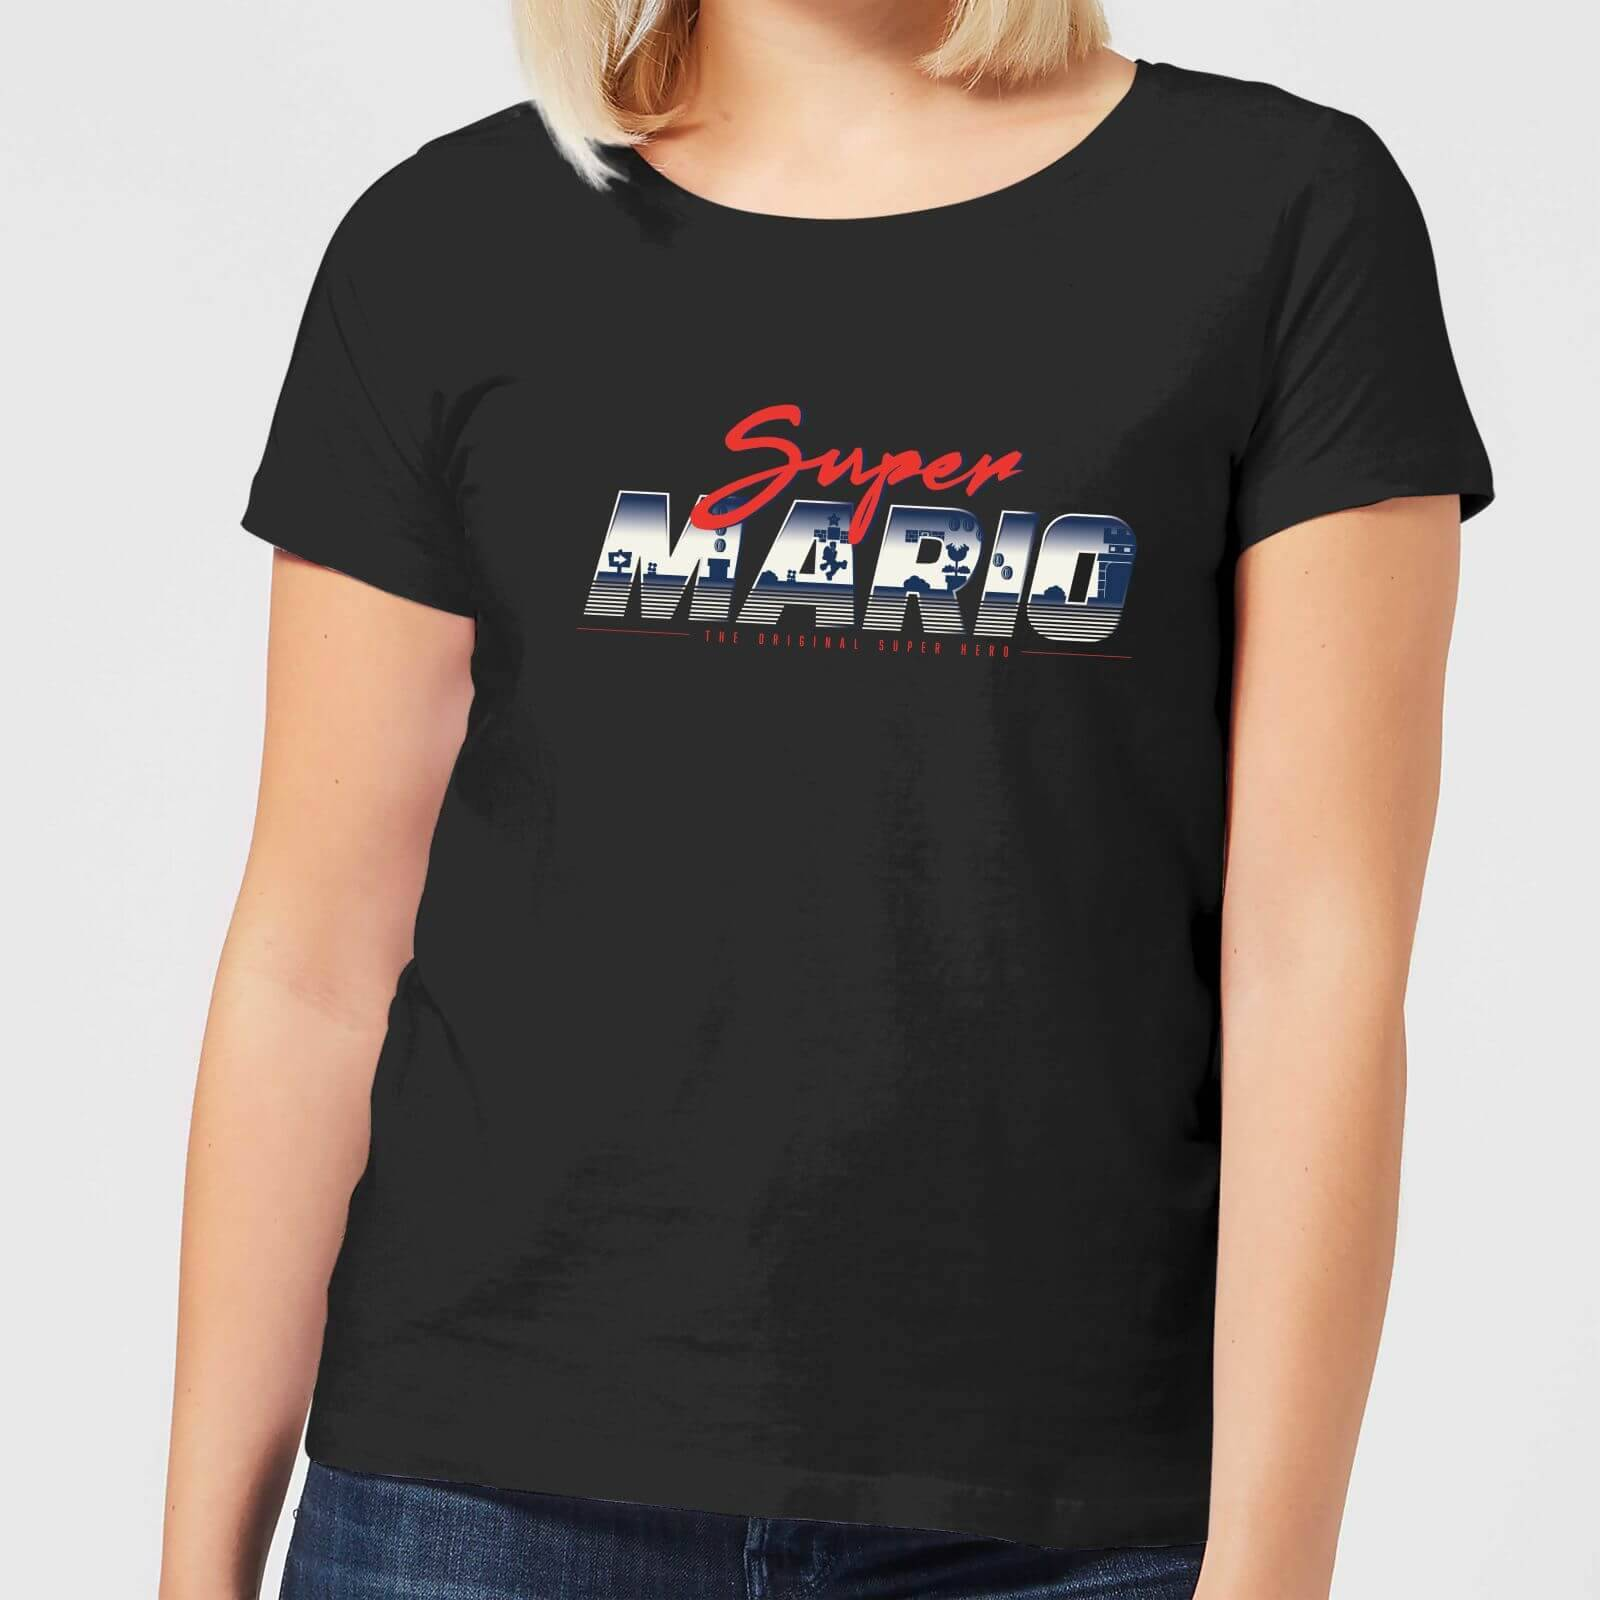 Nintendo Super Mario Original 80s Hero Women's T-Shirt - Black - XS - Black